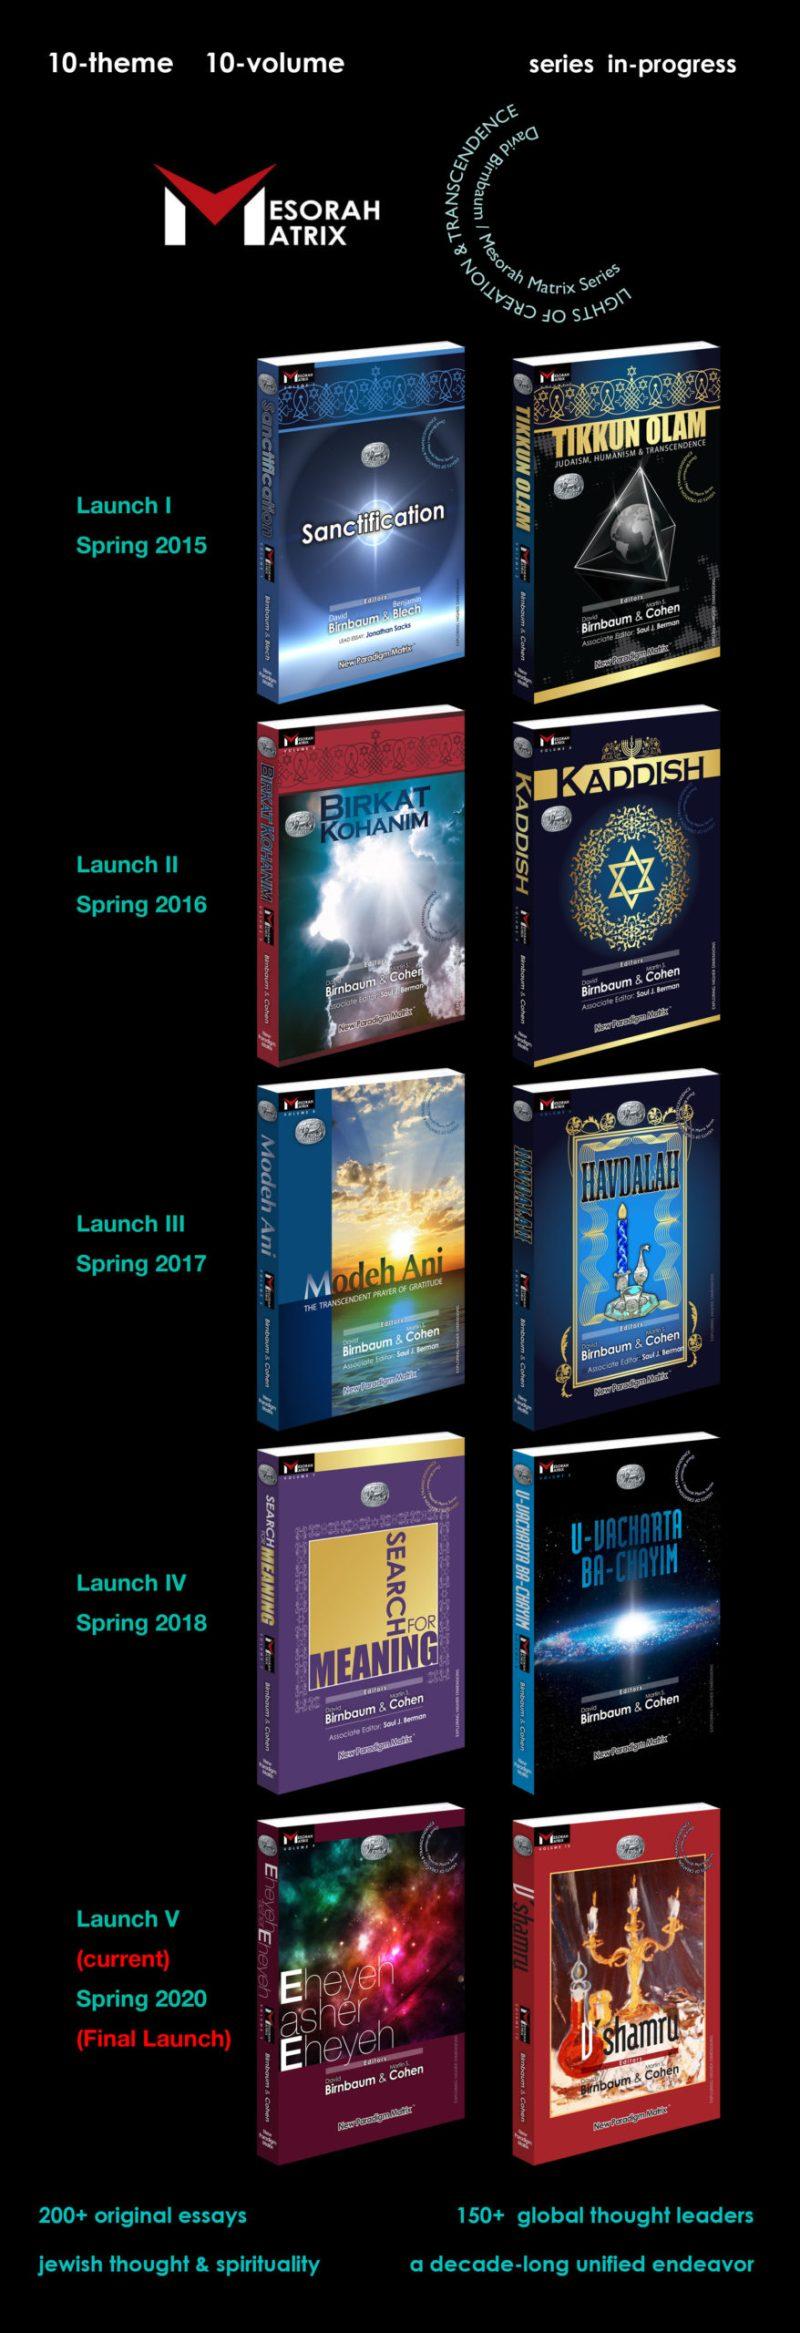 David Birnbaum - Mesorah Matrix Books